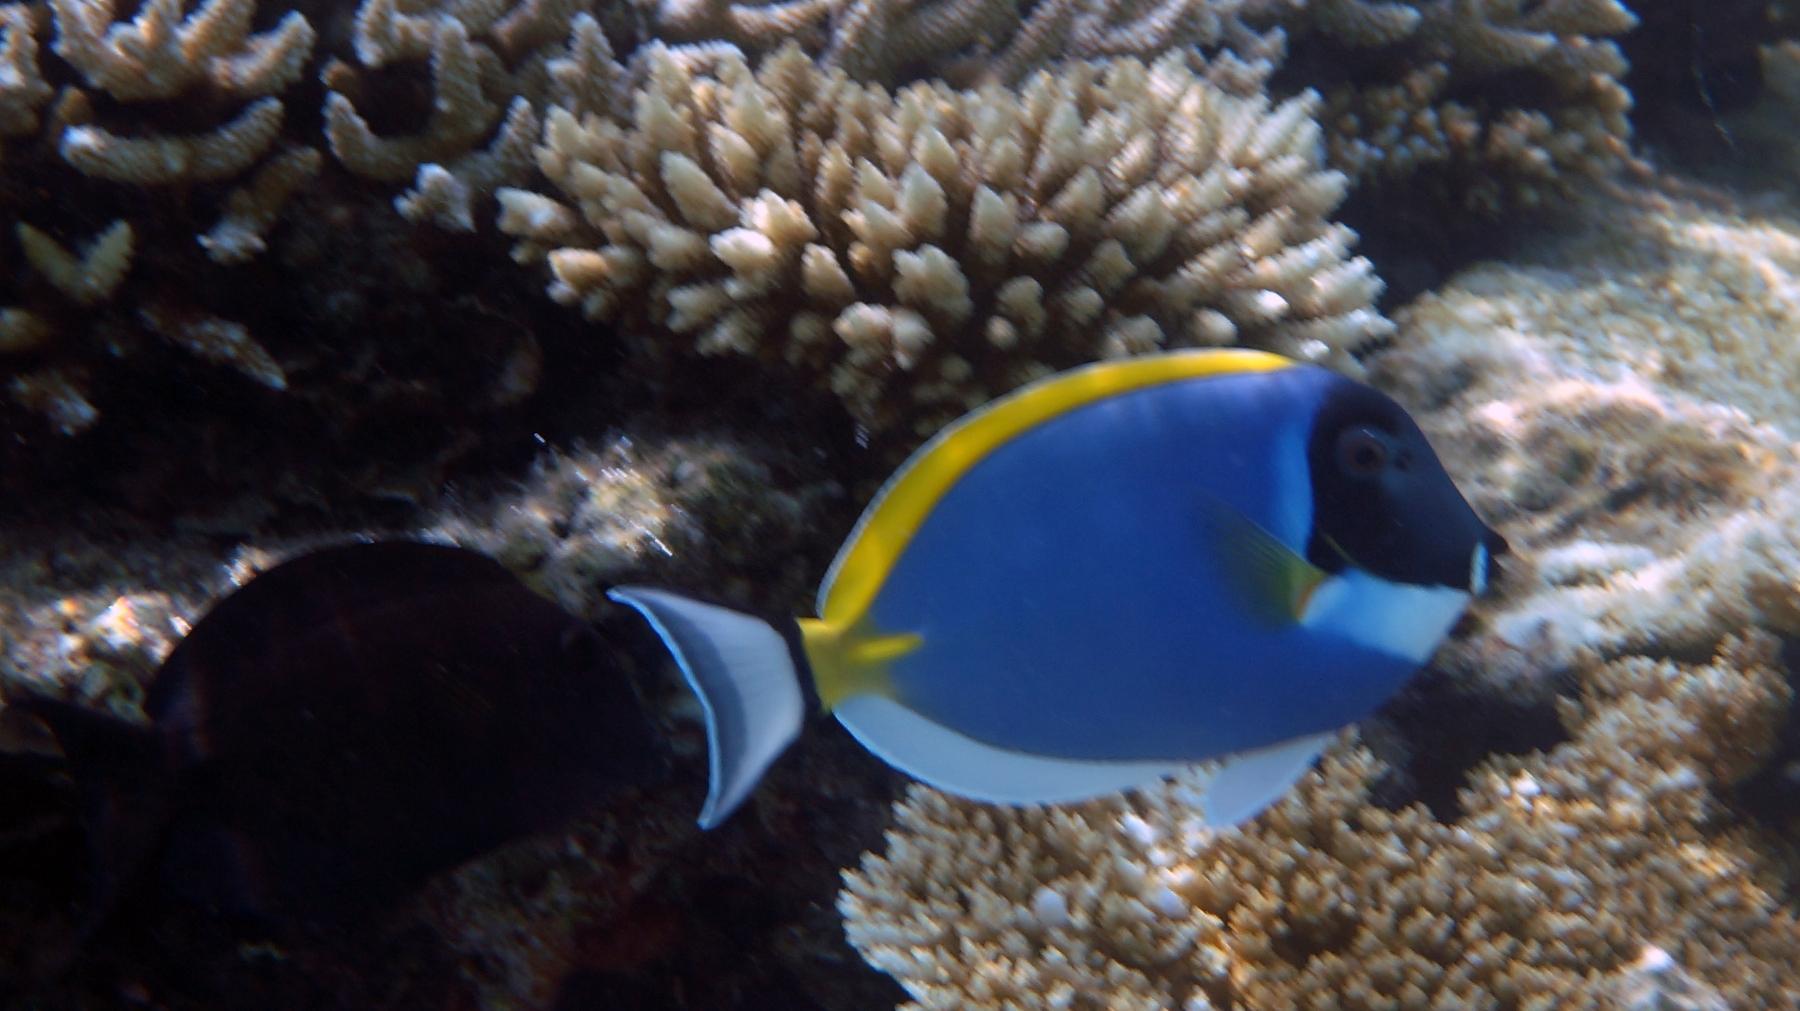 Acanthurus_leucosternon_008_C_Peces-Cirujano_L_Maldivas_U_Sebas_04072015